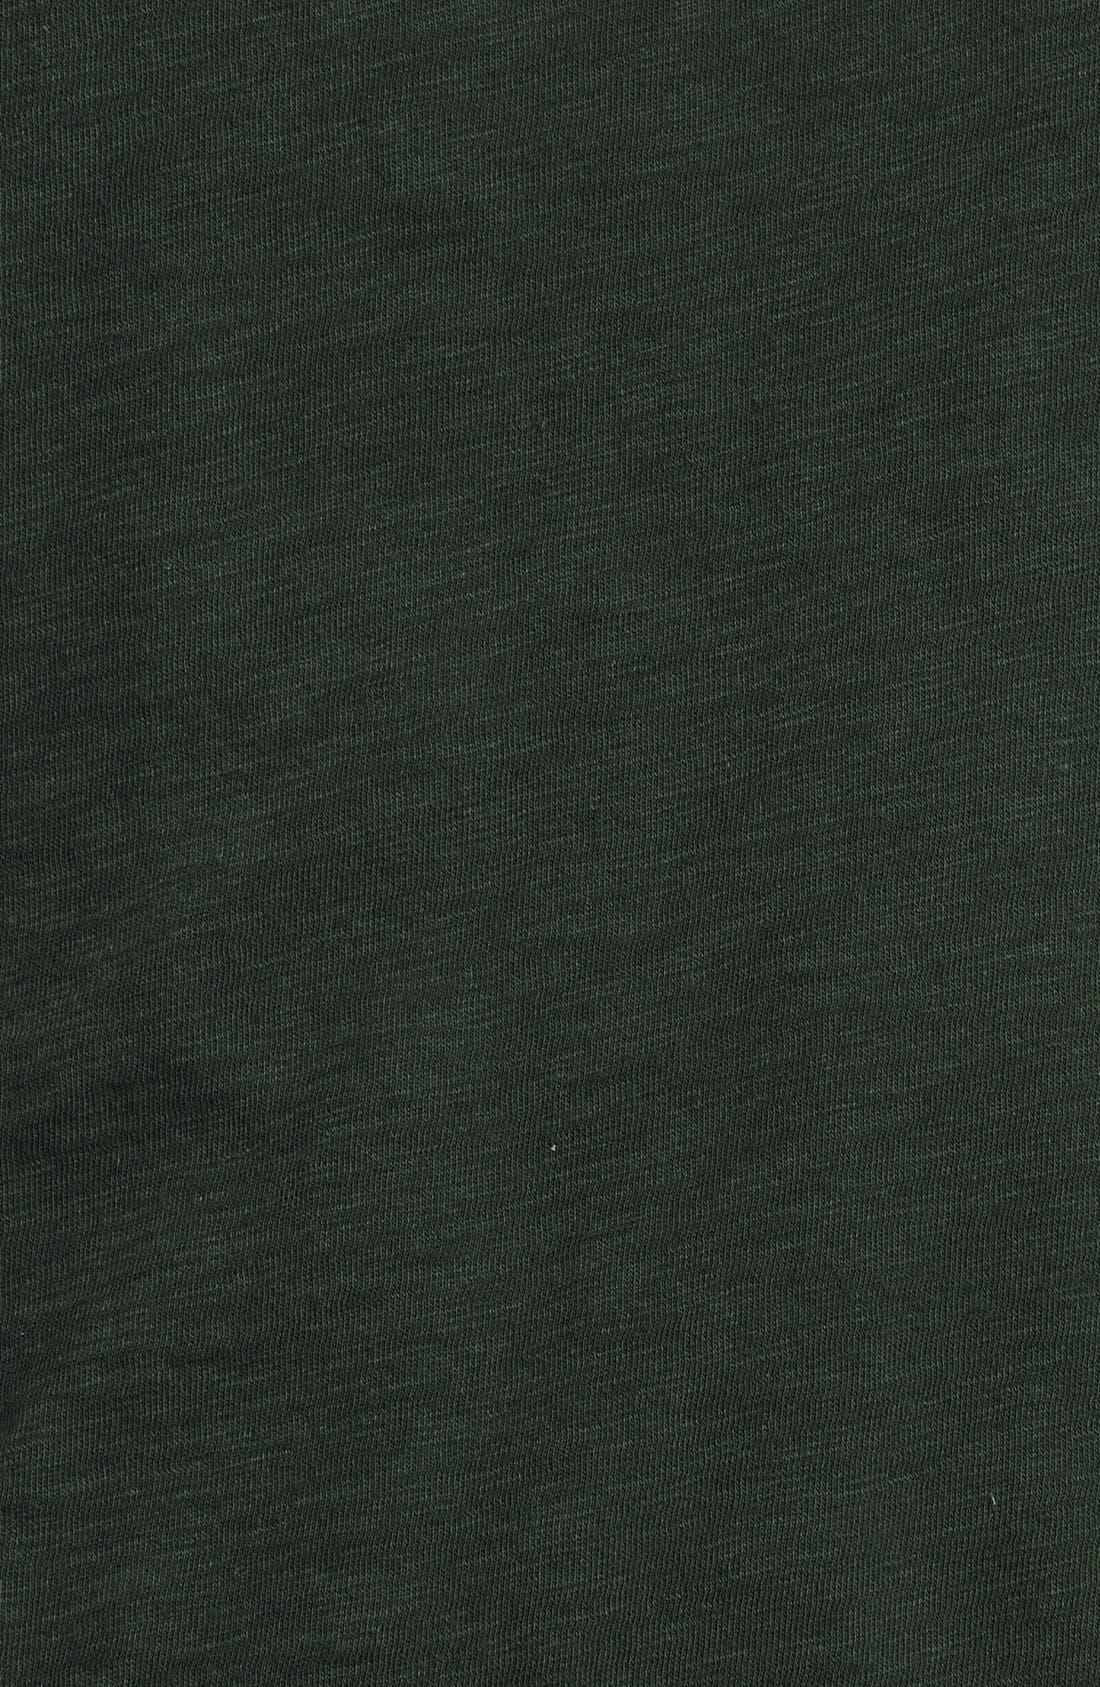 Alternate Image 2  - rag & bone/JEAN 'The Basic Brando' Tee